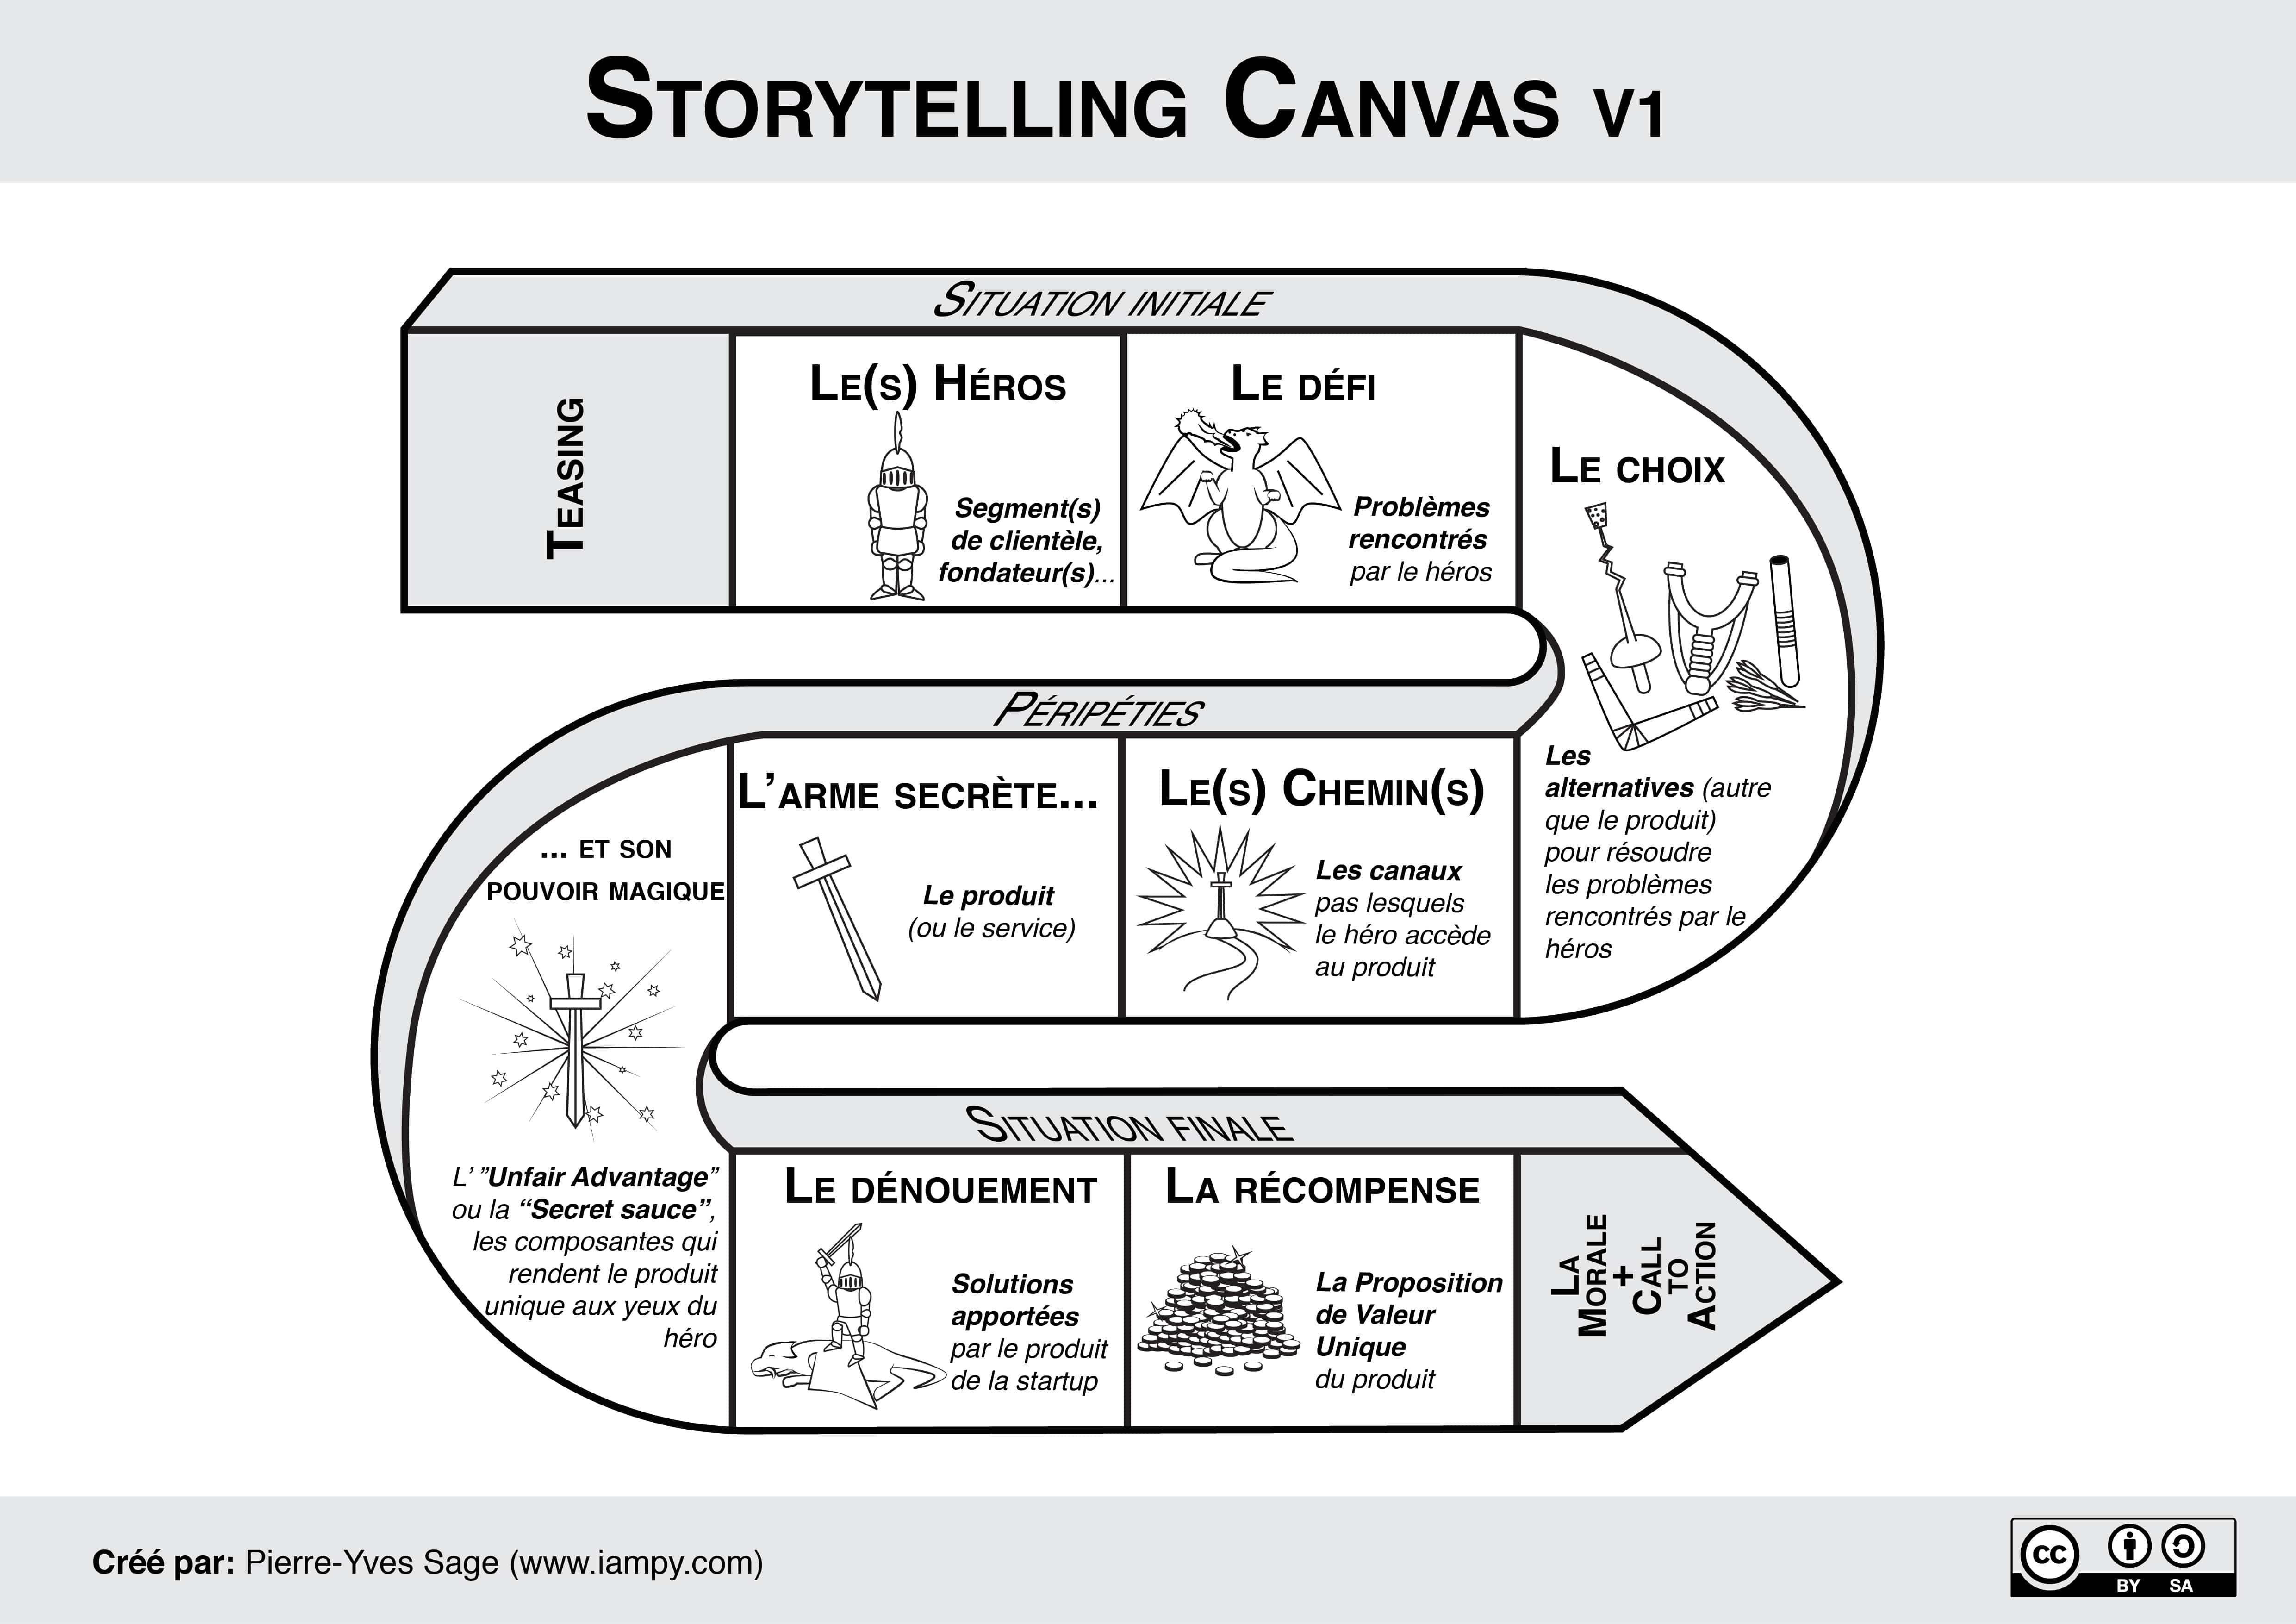 Comment utiliser le storytelling ? 5